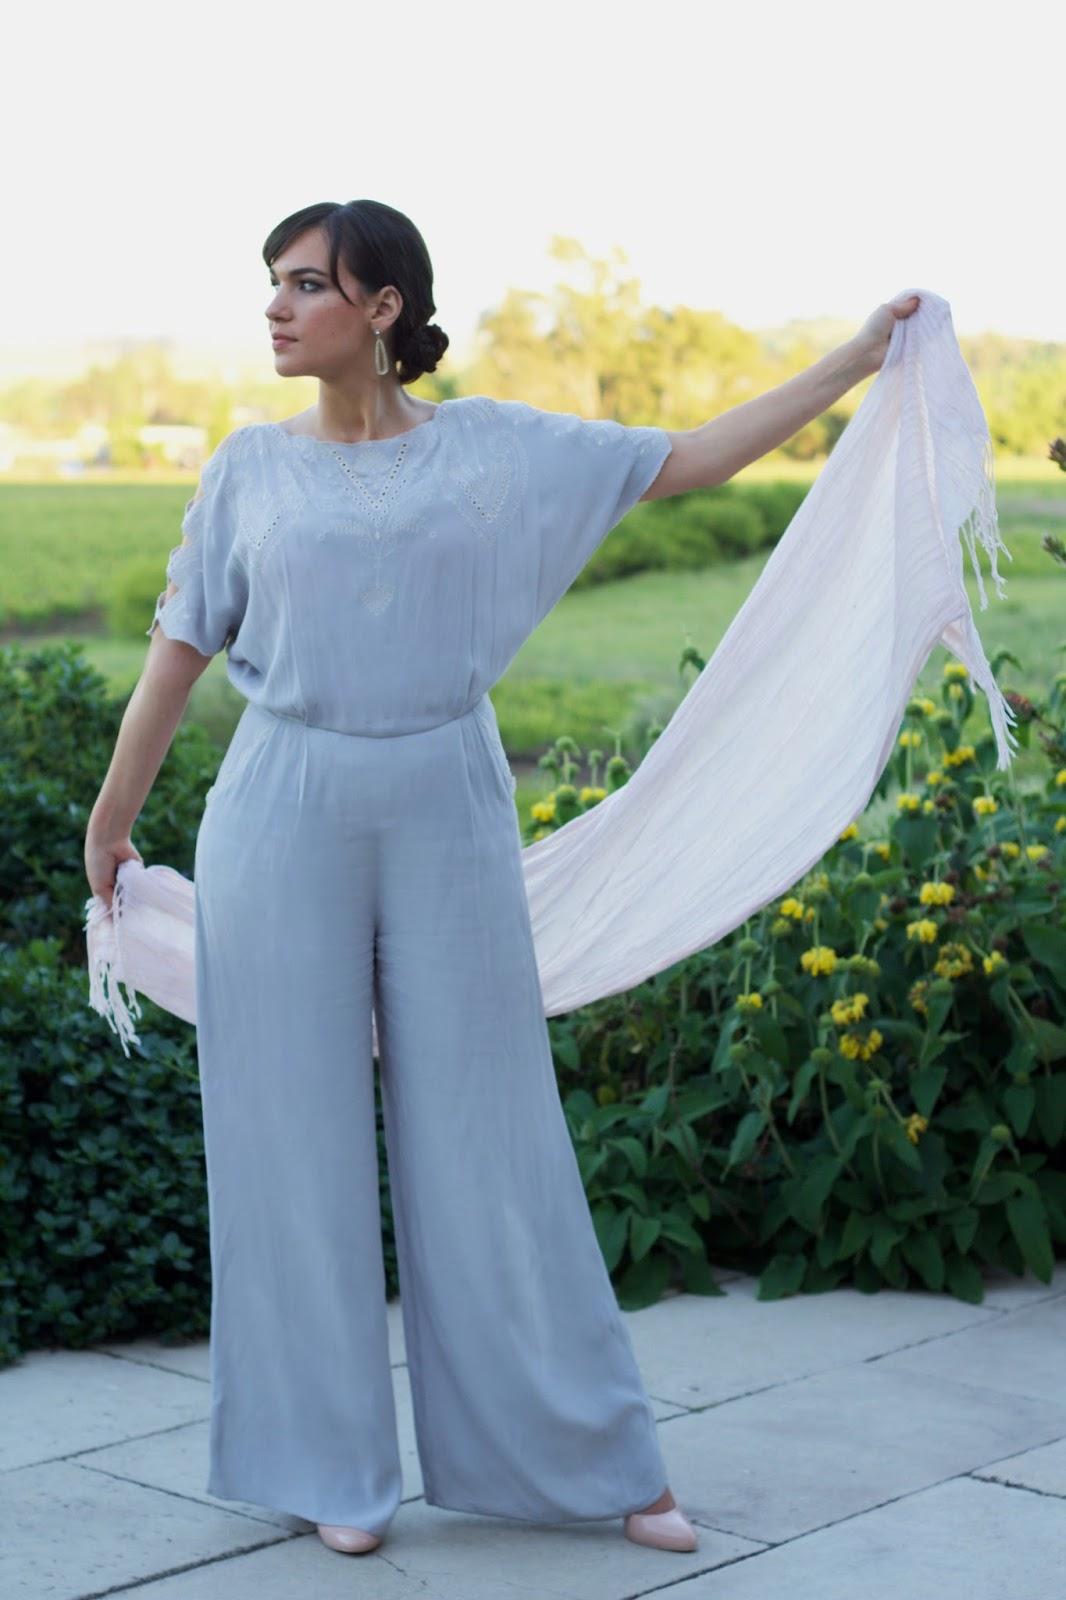 Fantastic Wedding Outfits For Guest Ideas - Wedding Ideas ...